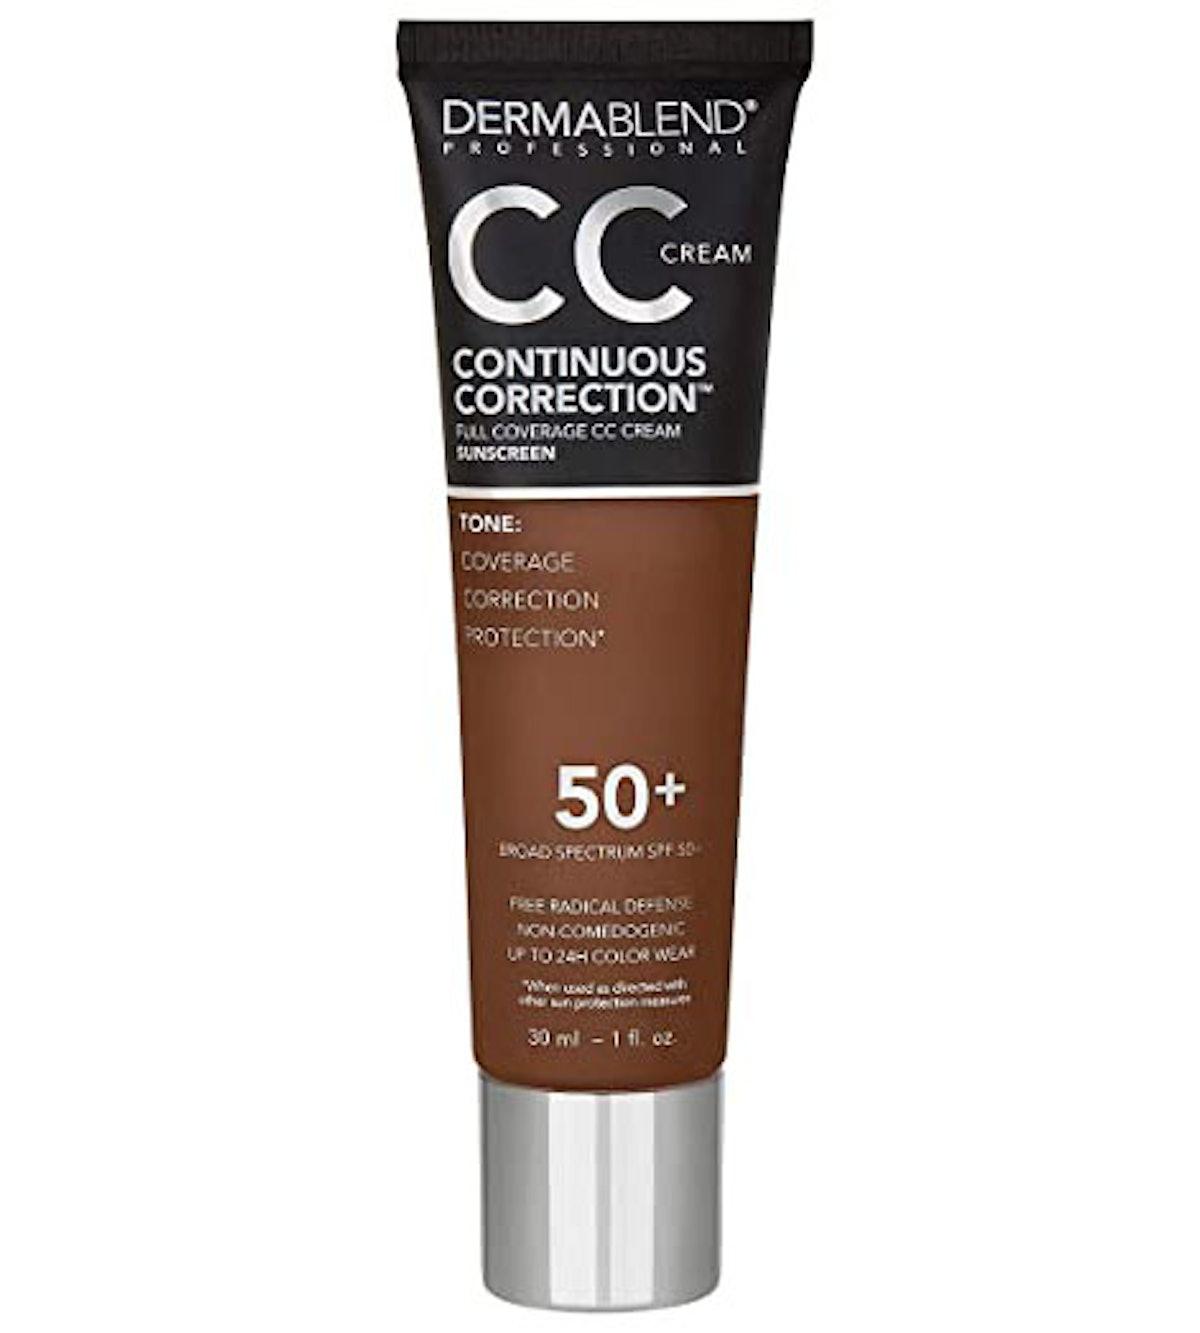 Dermablend Continuous Correction Tone-Evening CC Cream